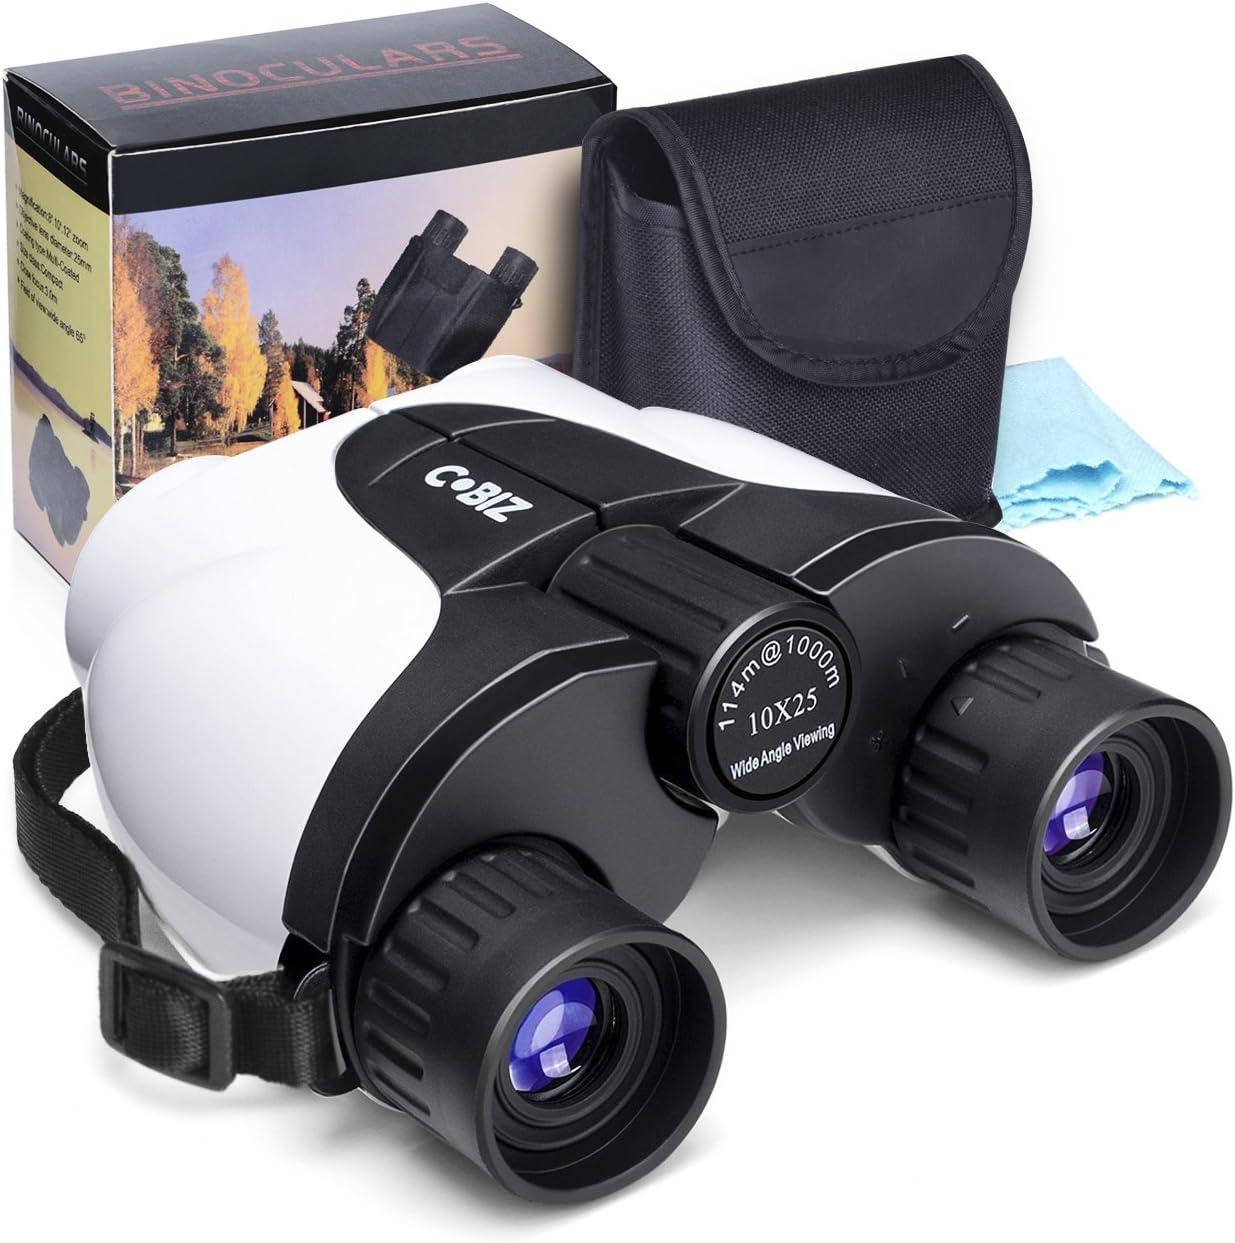 Top 14 Best Binoculars For Kids (2020 Reviews & Buying Guide) 2